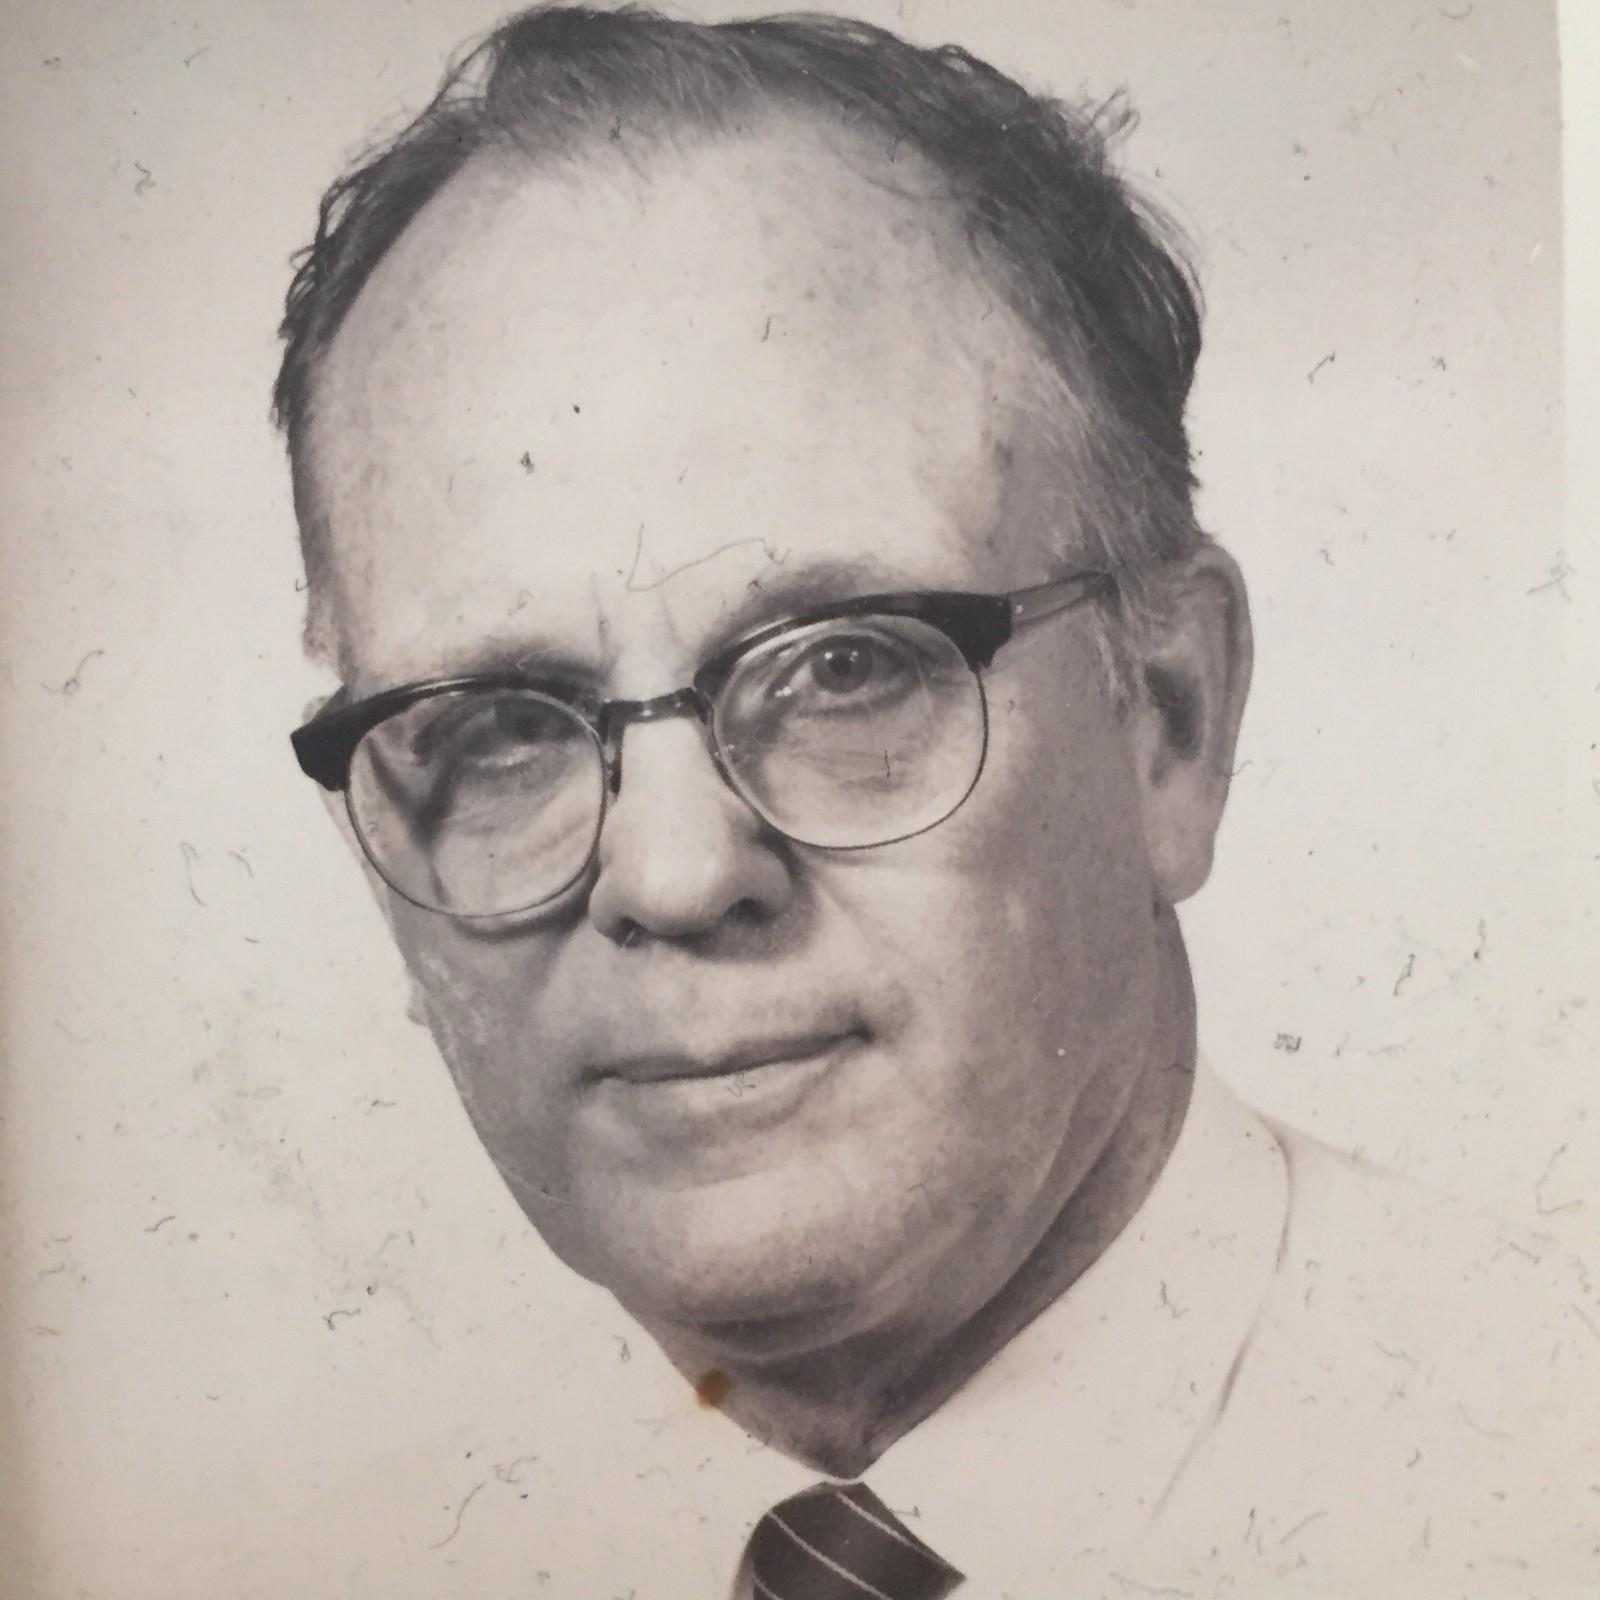 Happy Father's Day – My Kidd Kraddick / Caroline Cradick Story